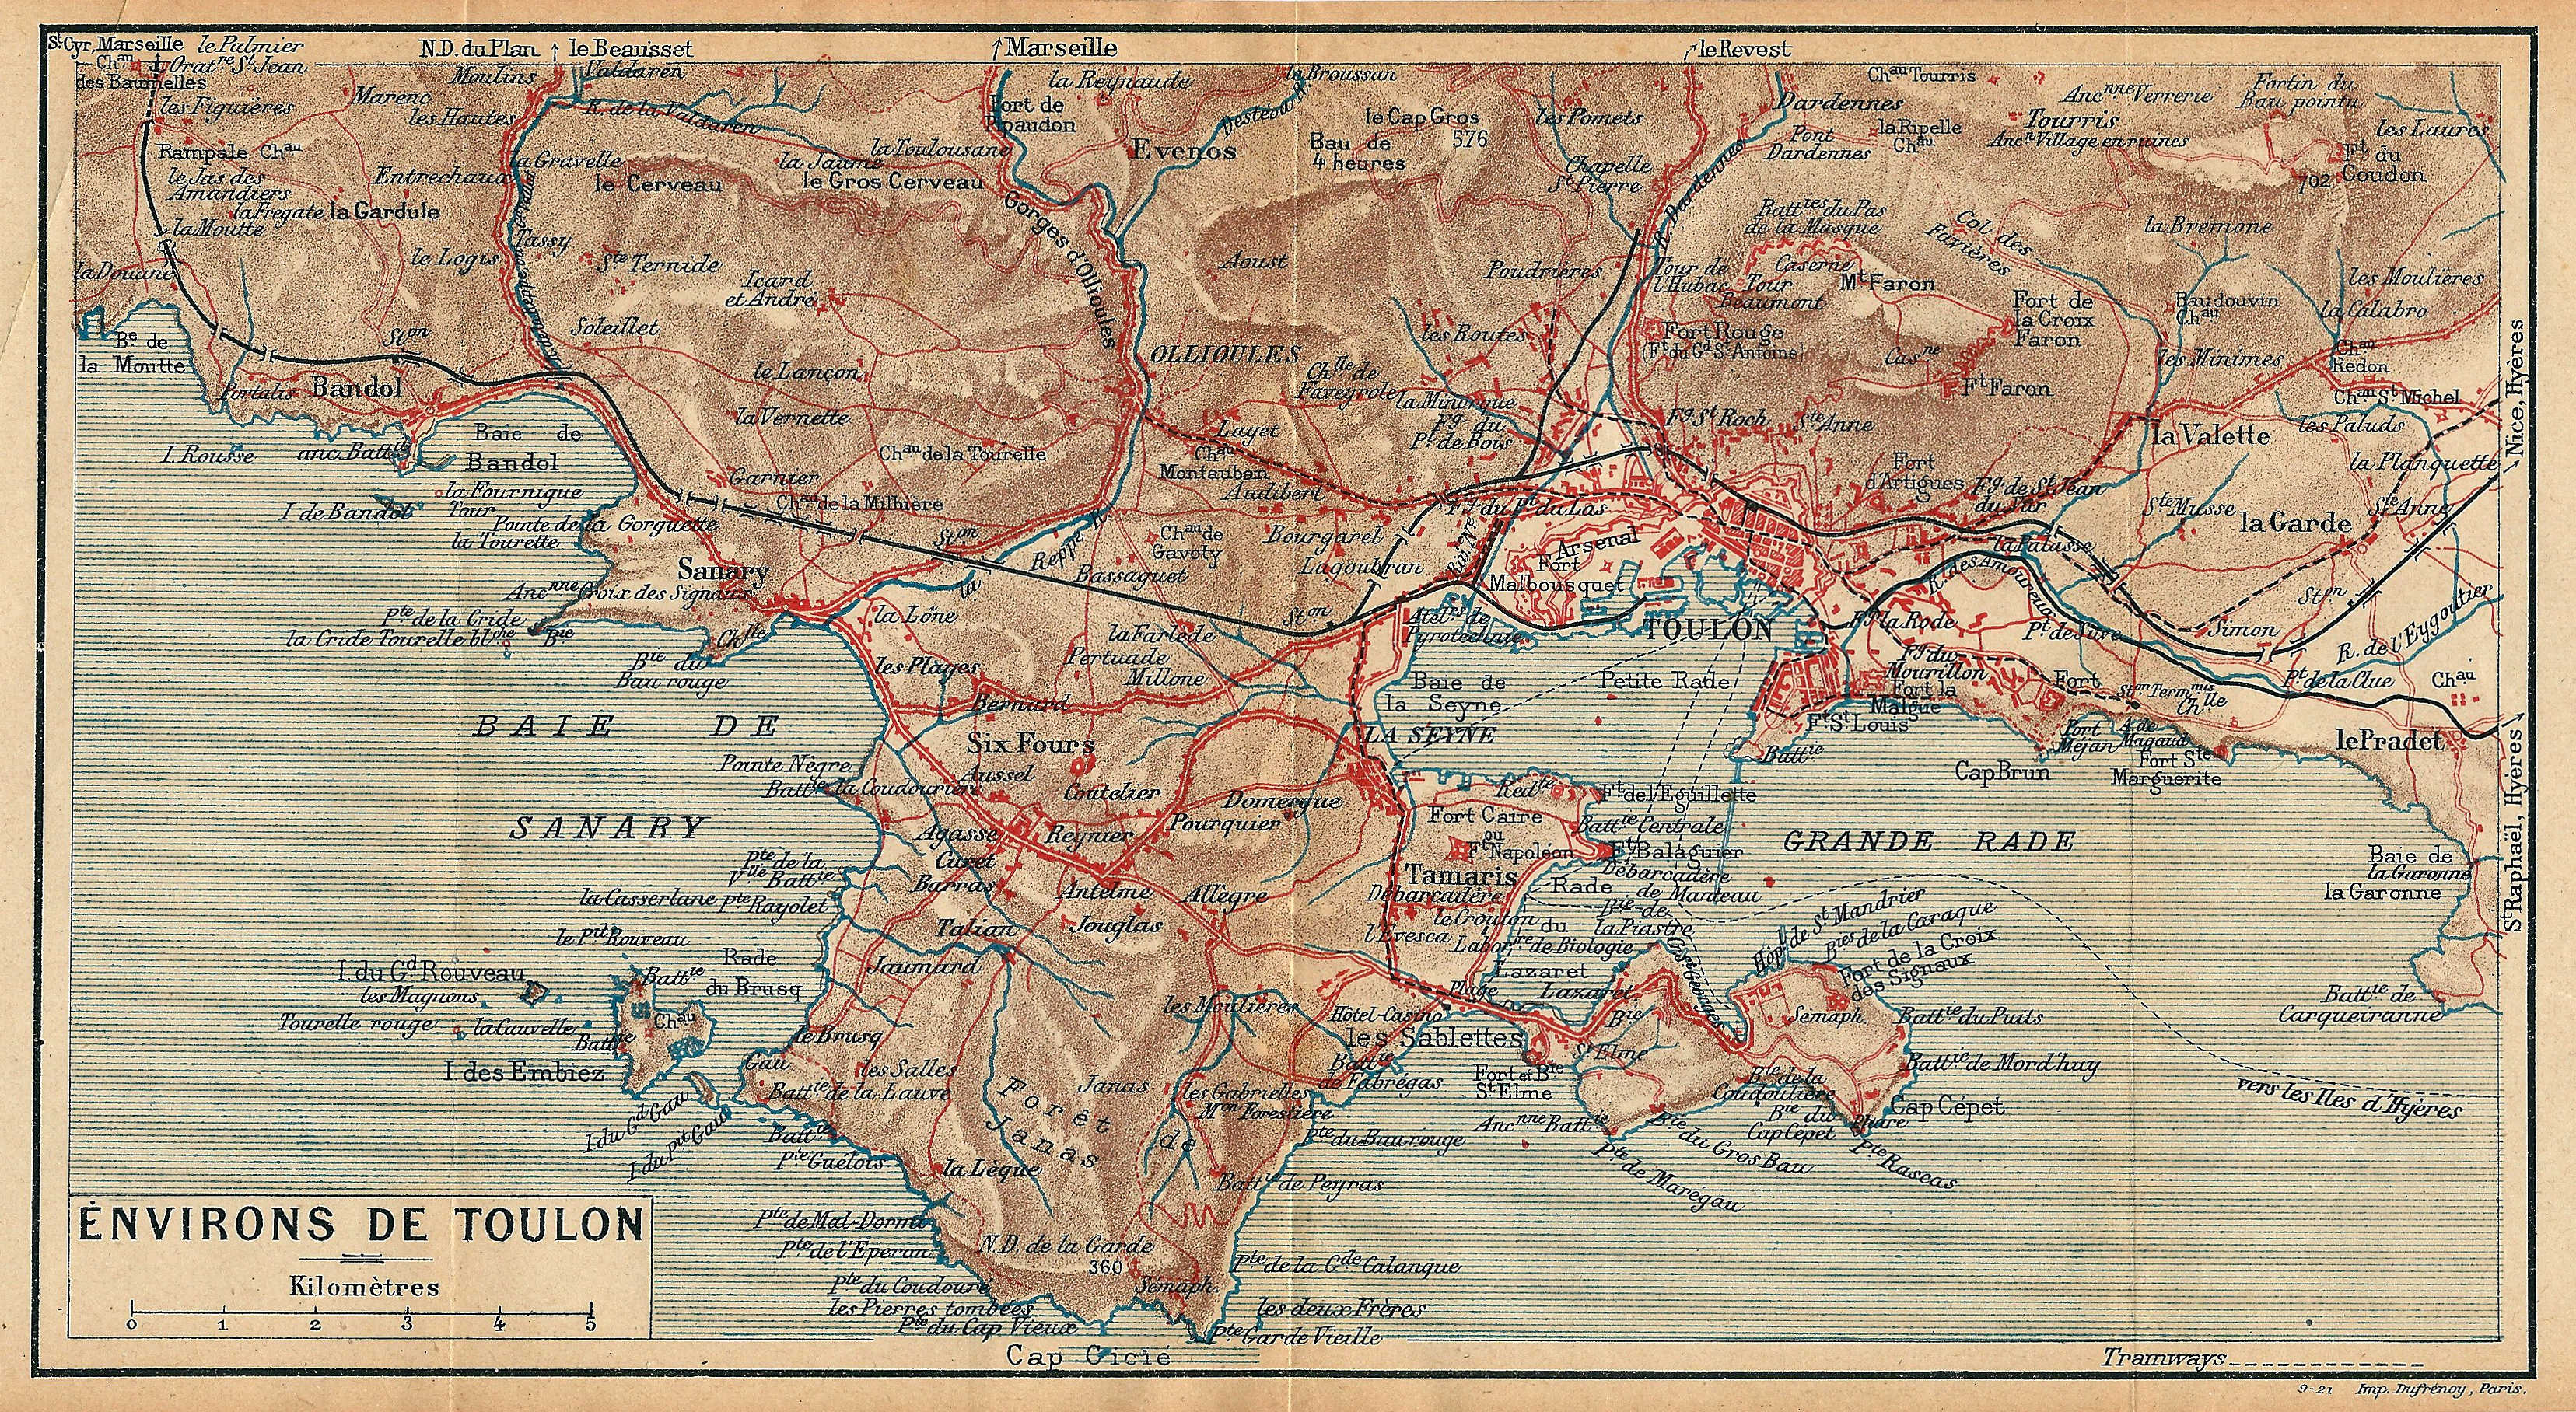 carte toulon et environs File:Toulon environs 1921 Carte 29.   Wikimedia Commons